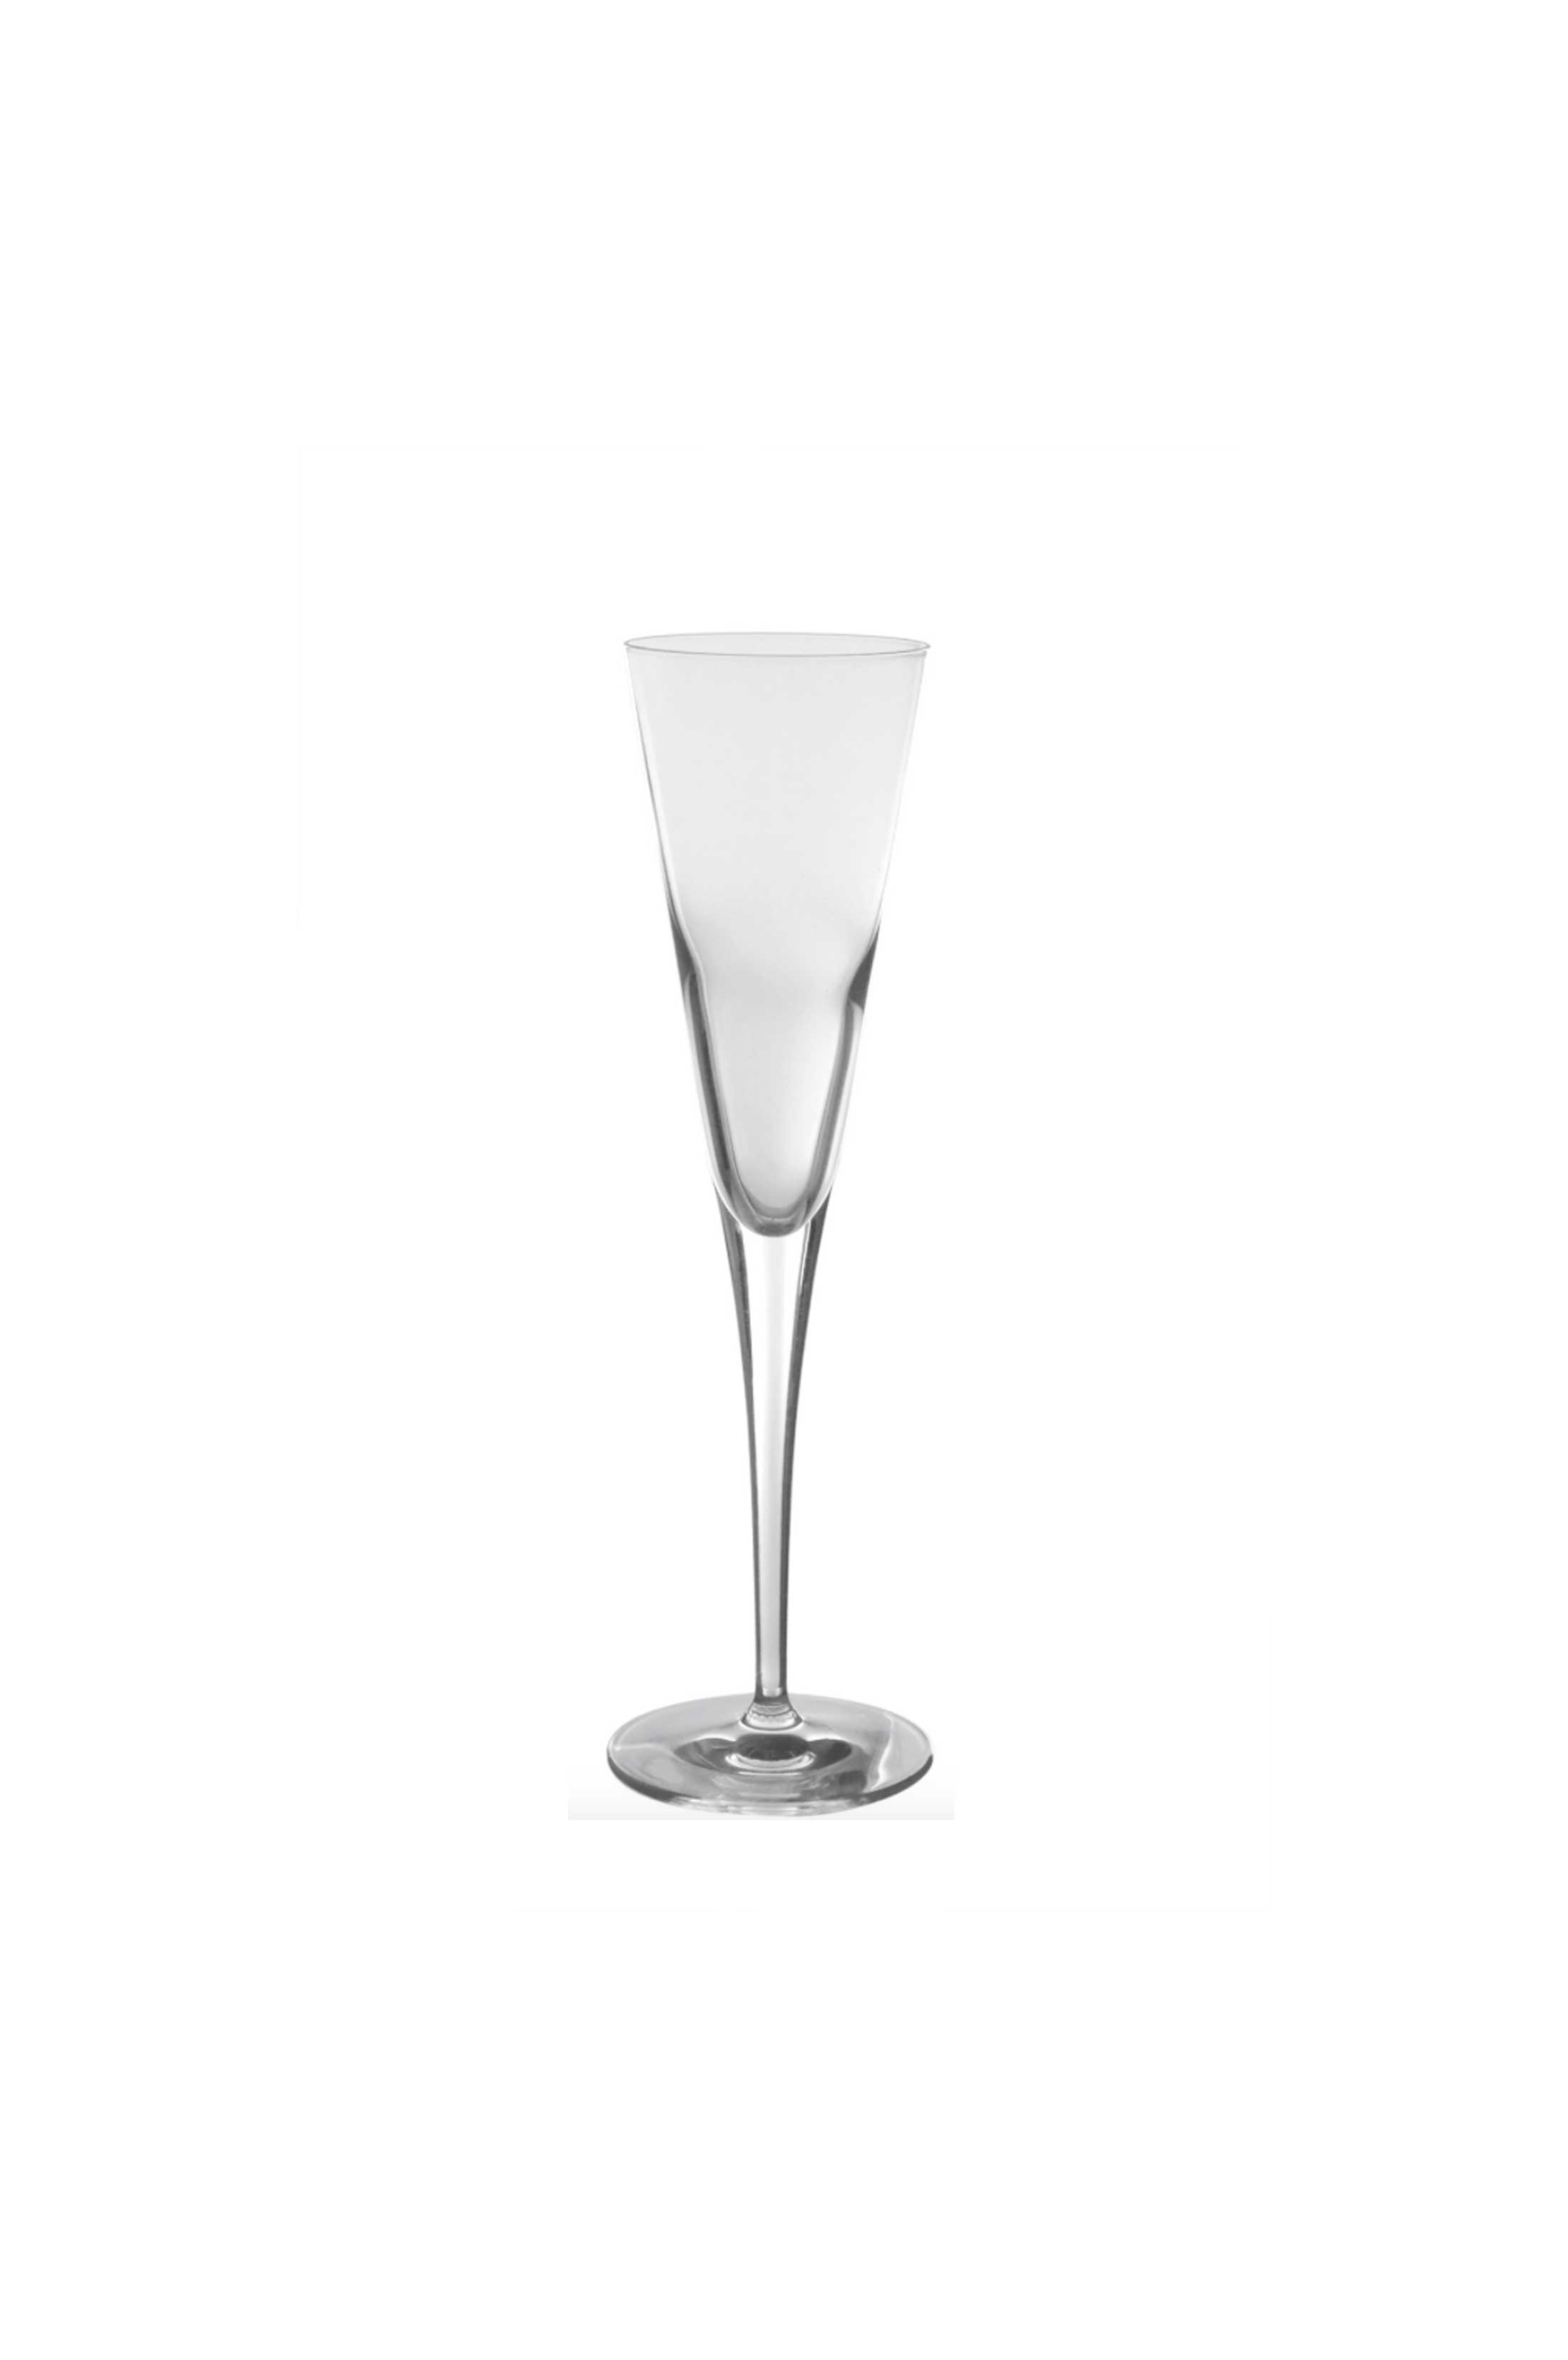 bicchieri affitto a lungo termine